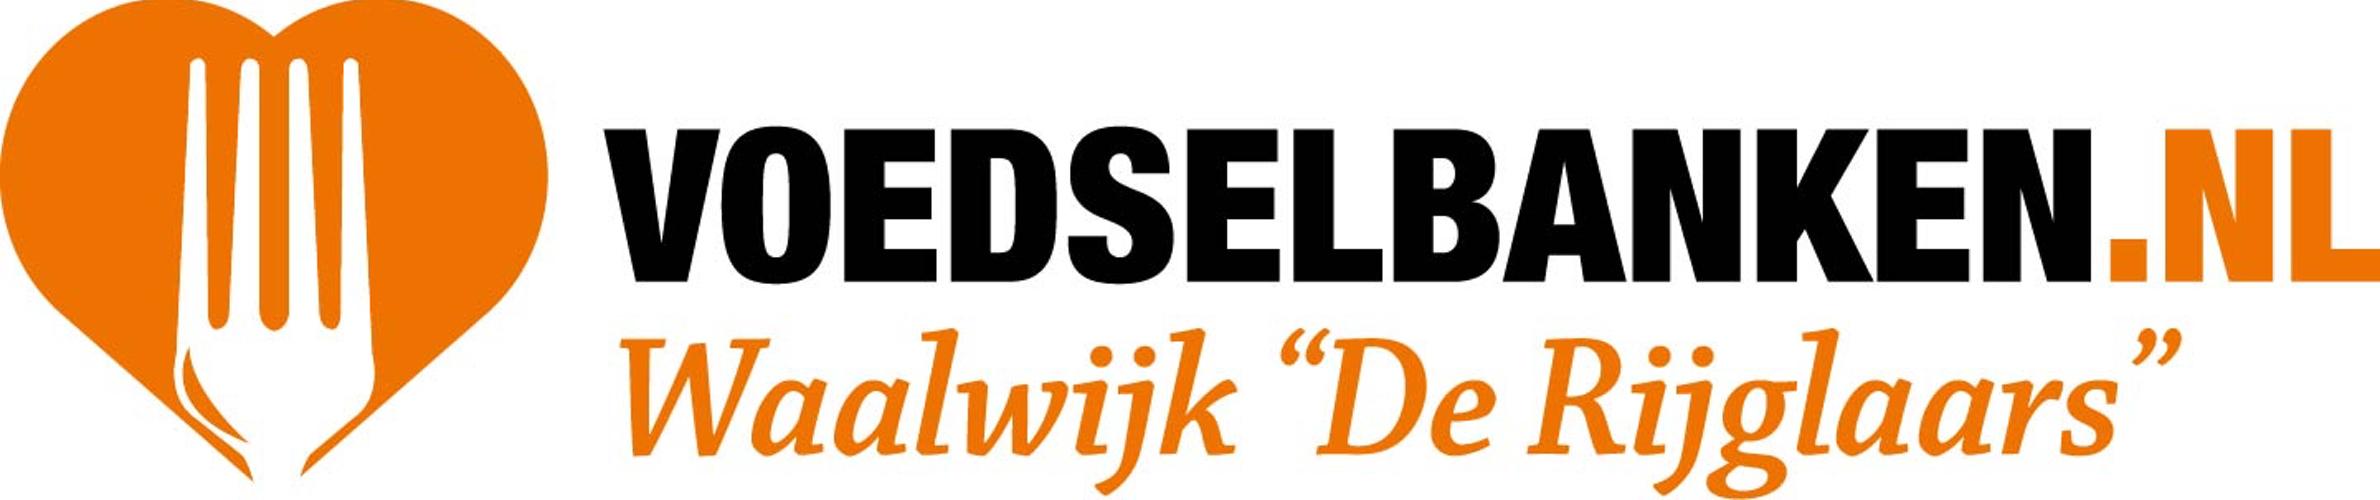 Voedselbank Waalwijk logo